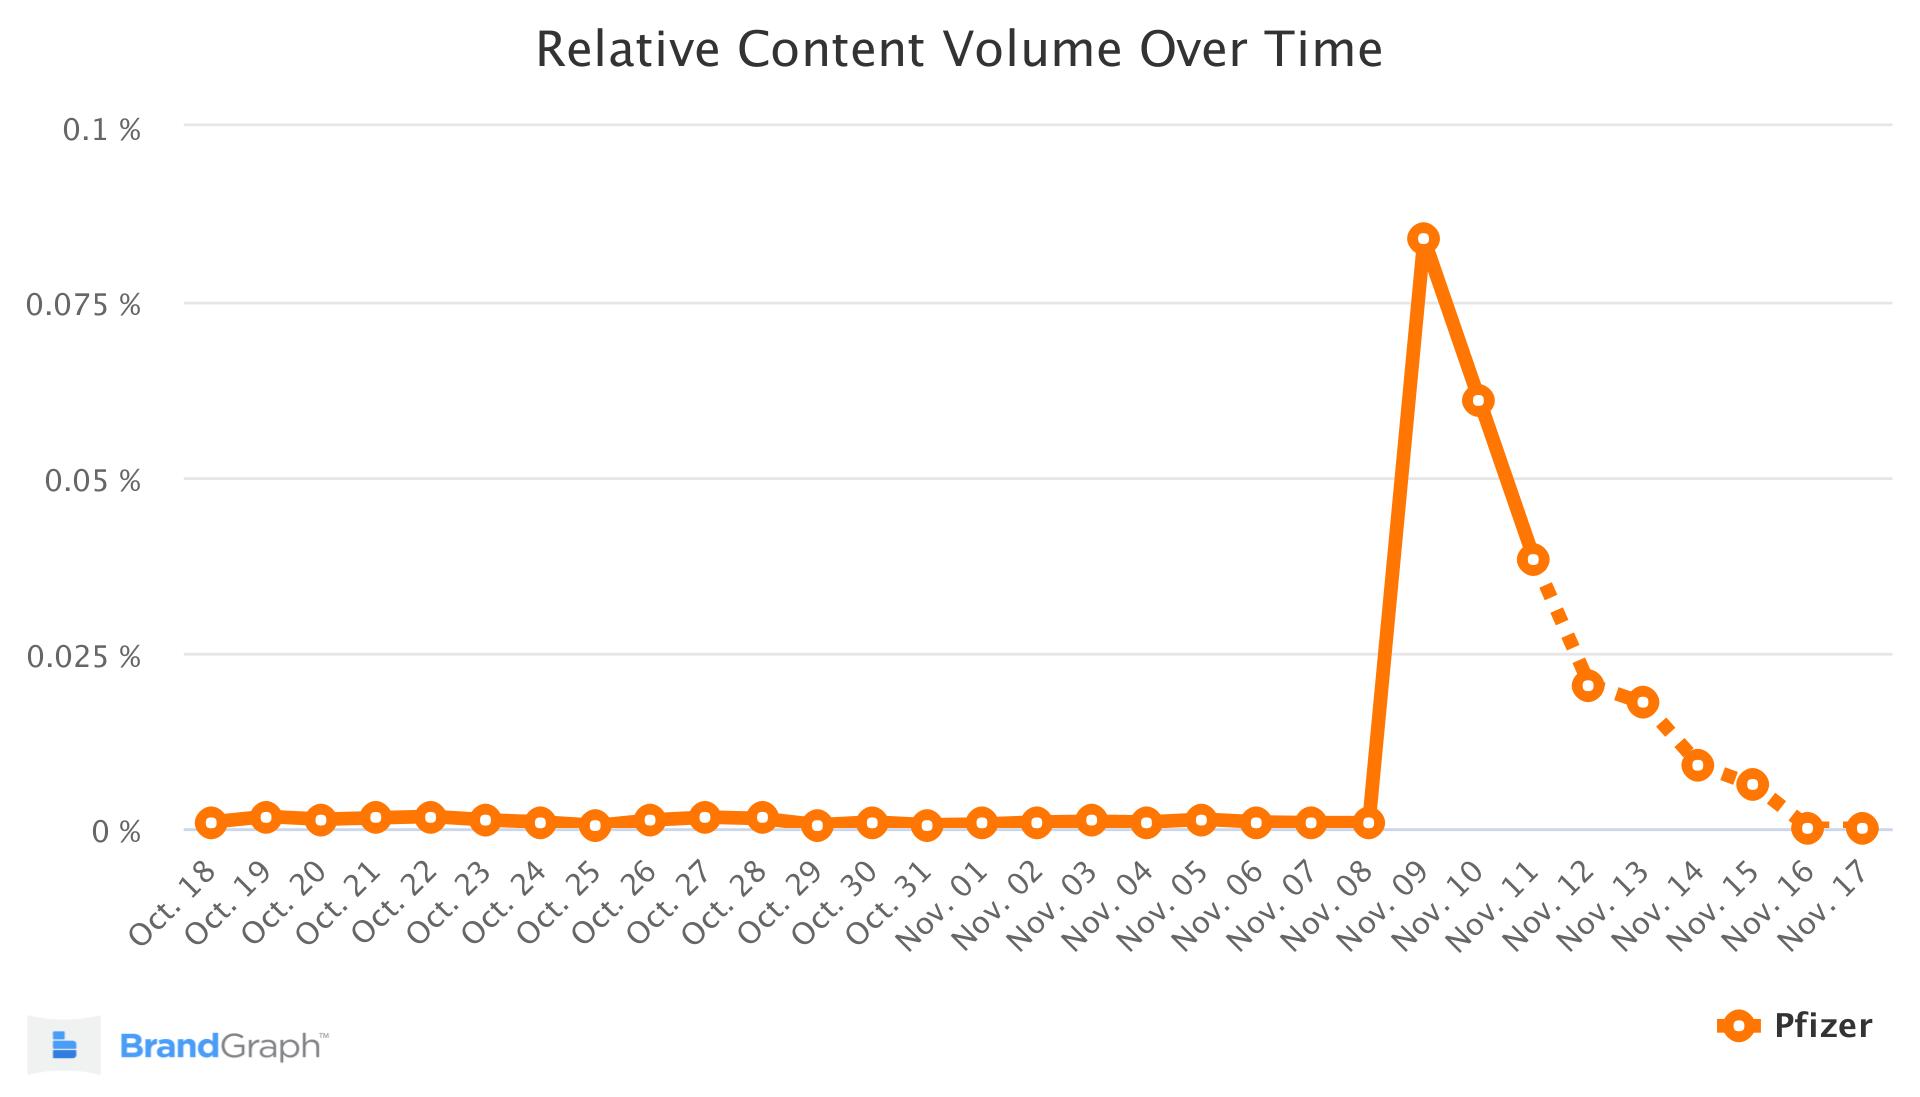 Pfizer BrandGraph Trend